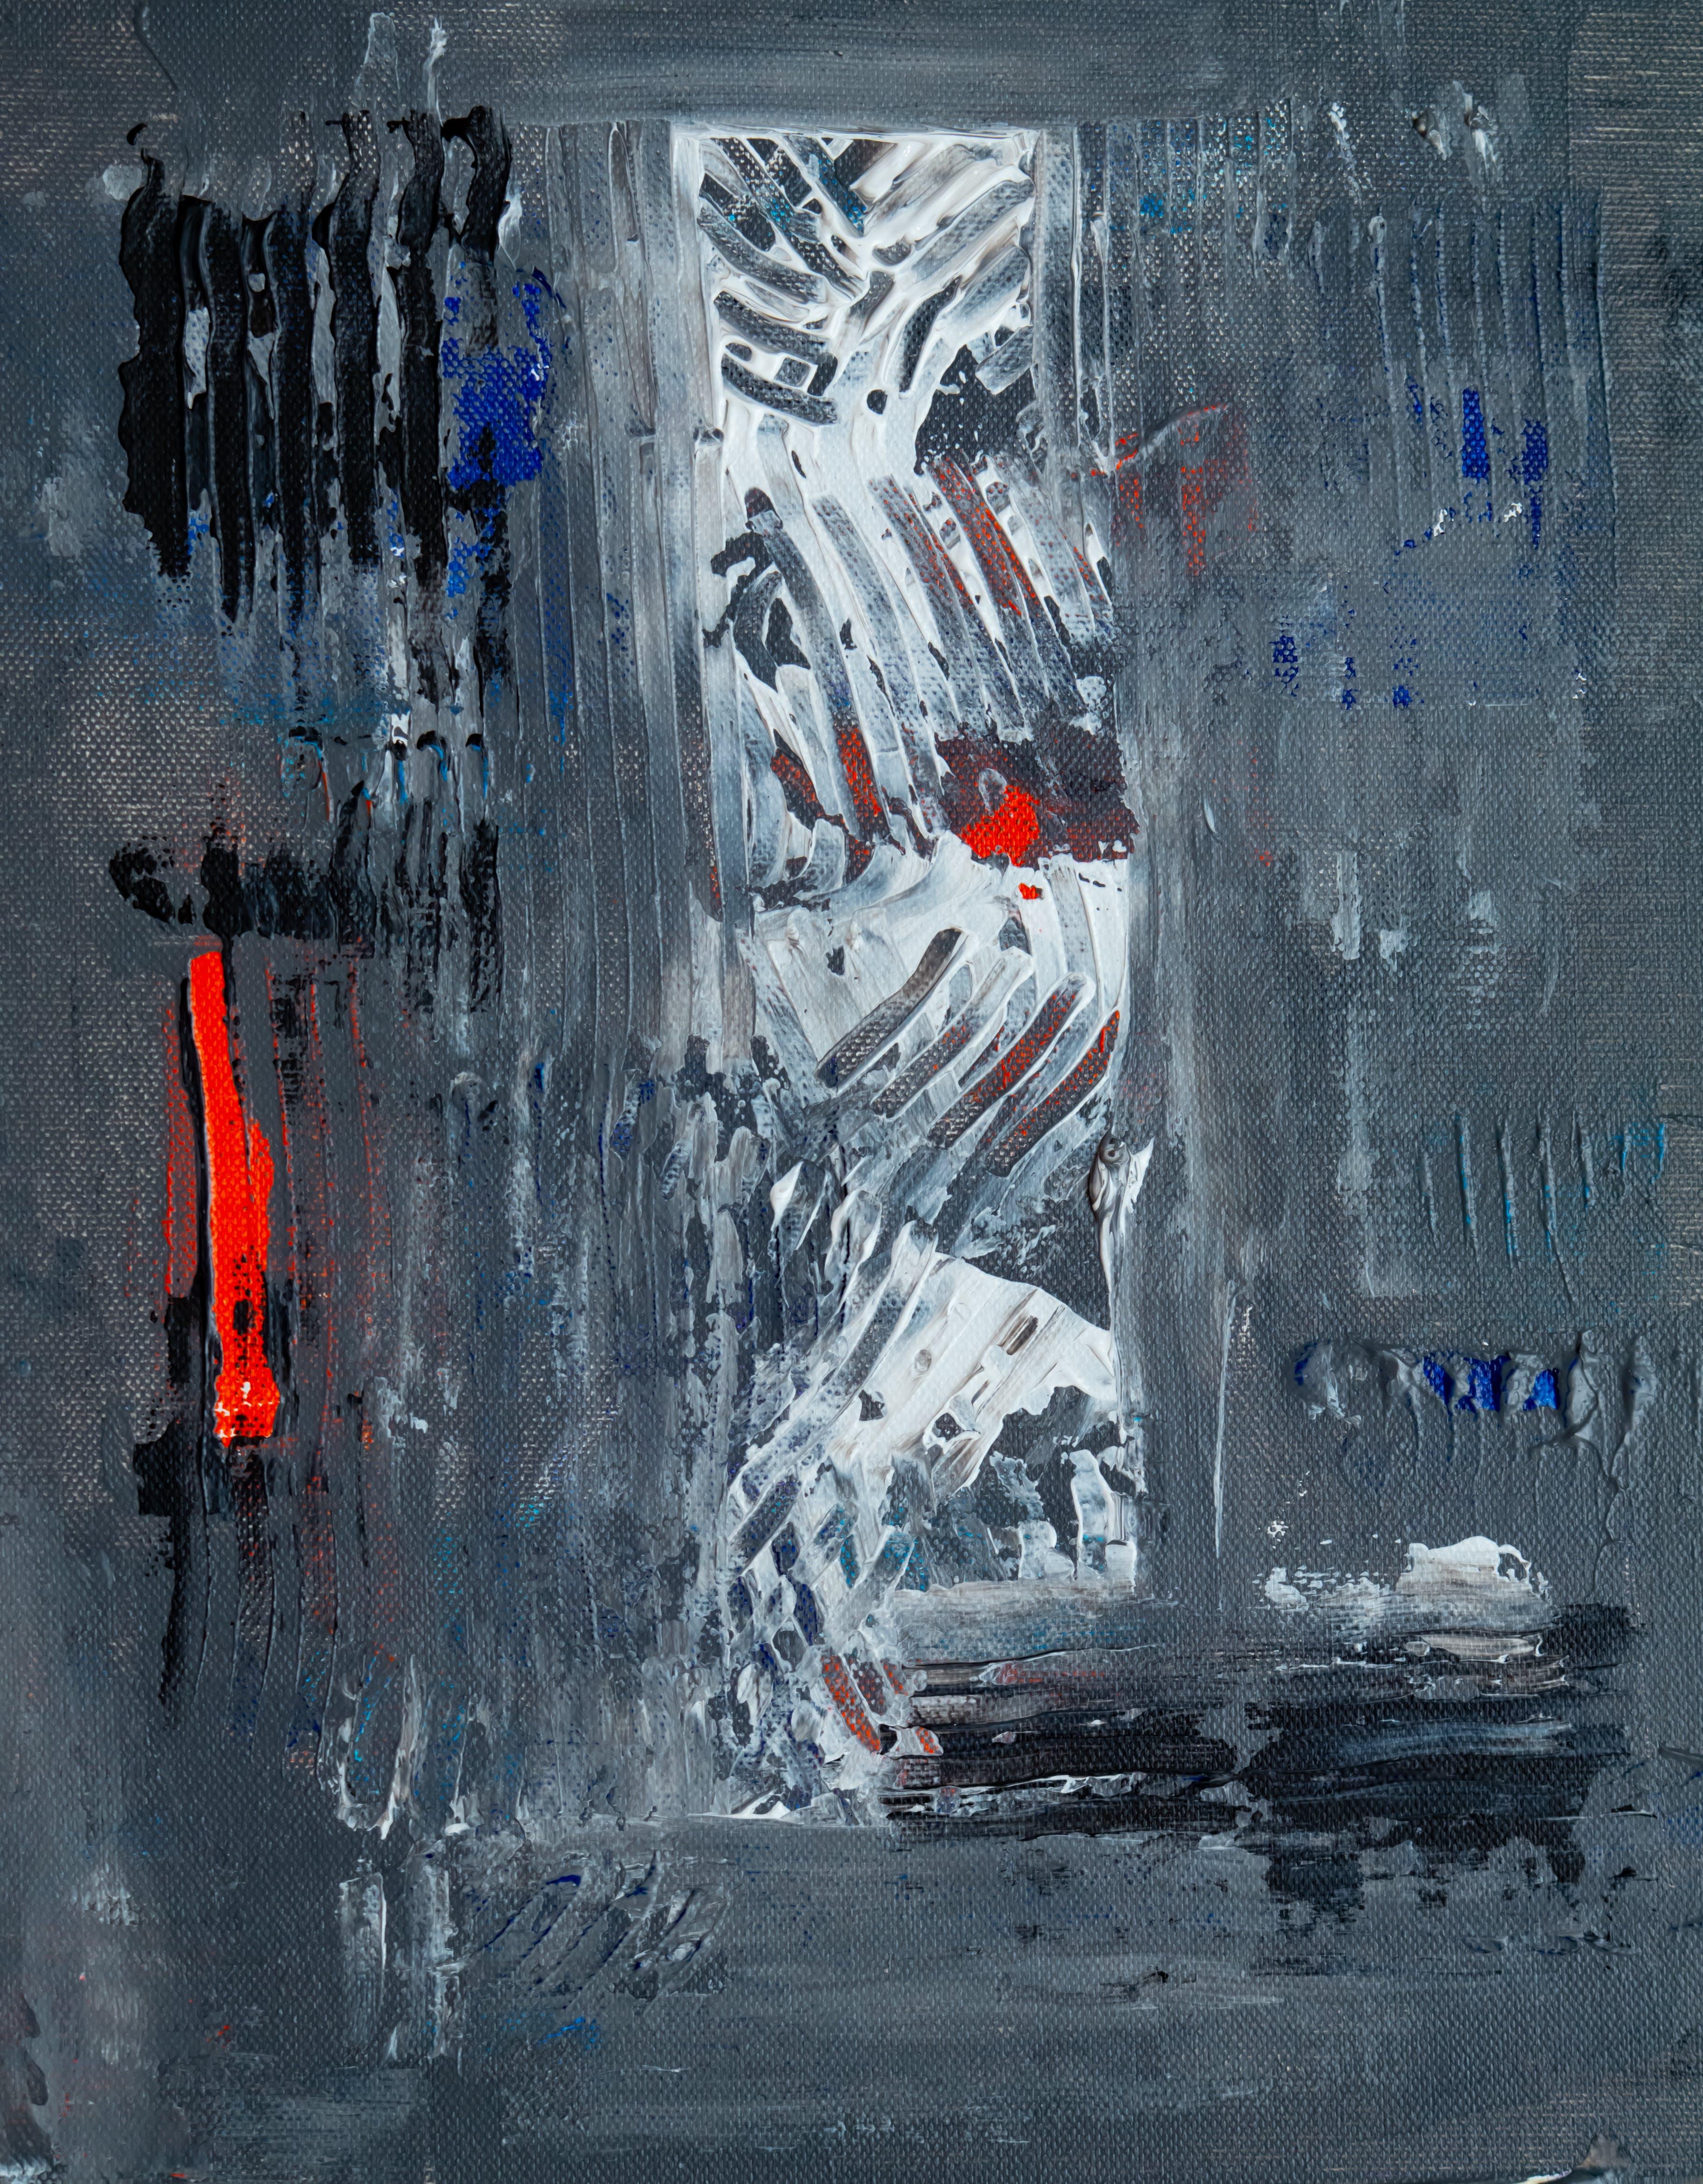 Kostenloses Stock Foto zu abstrakter expressionismus, abstraktes gemälde, acryl, acrylfarbe